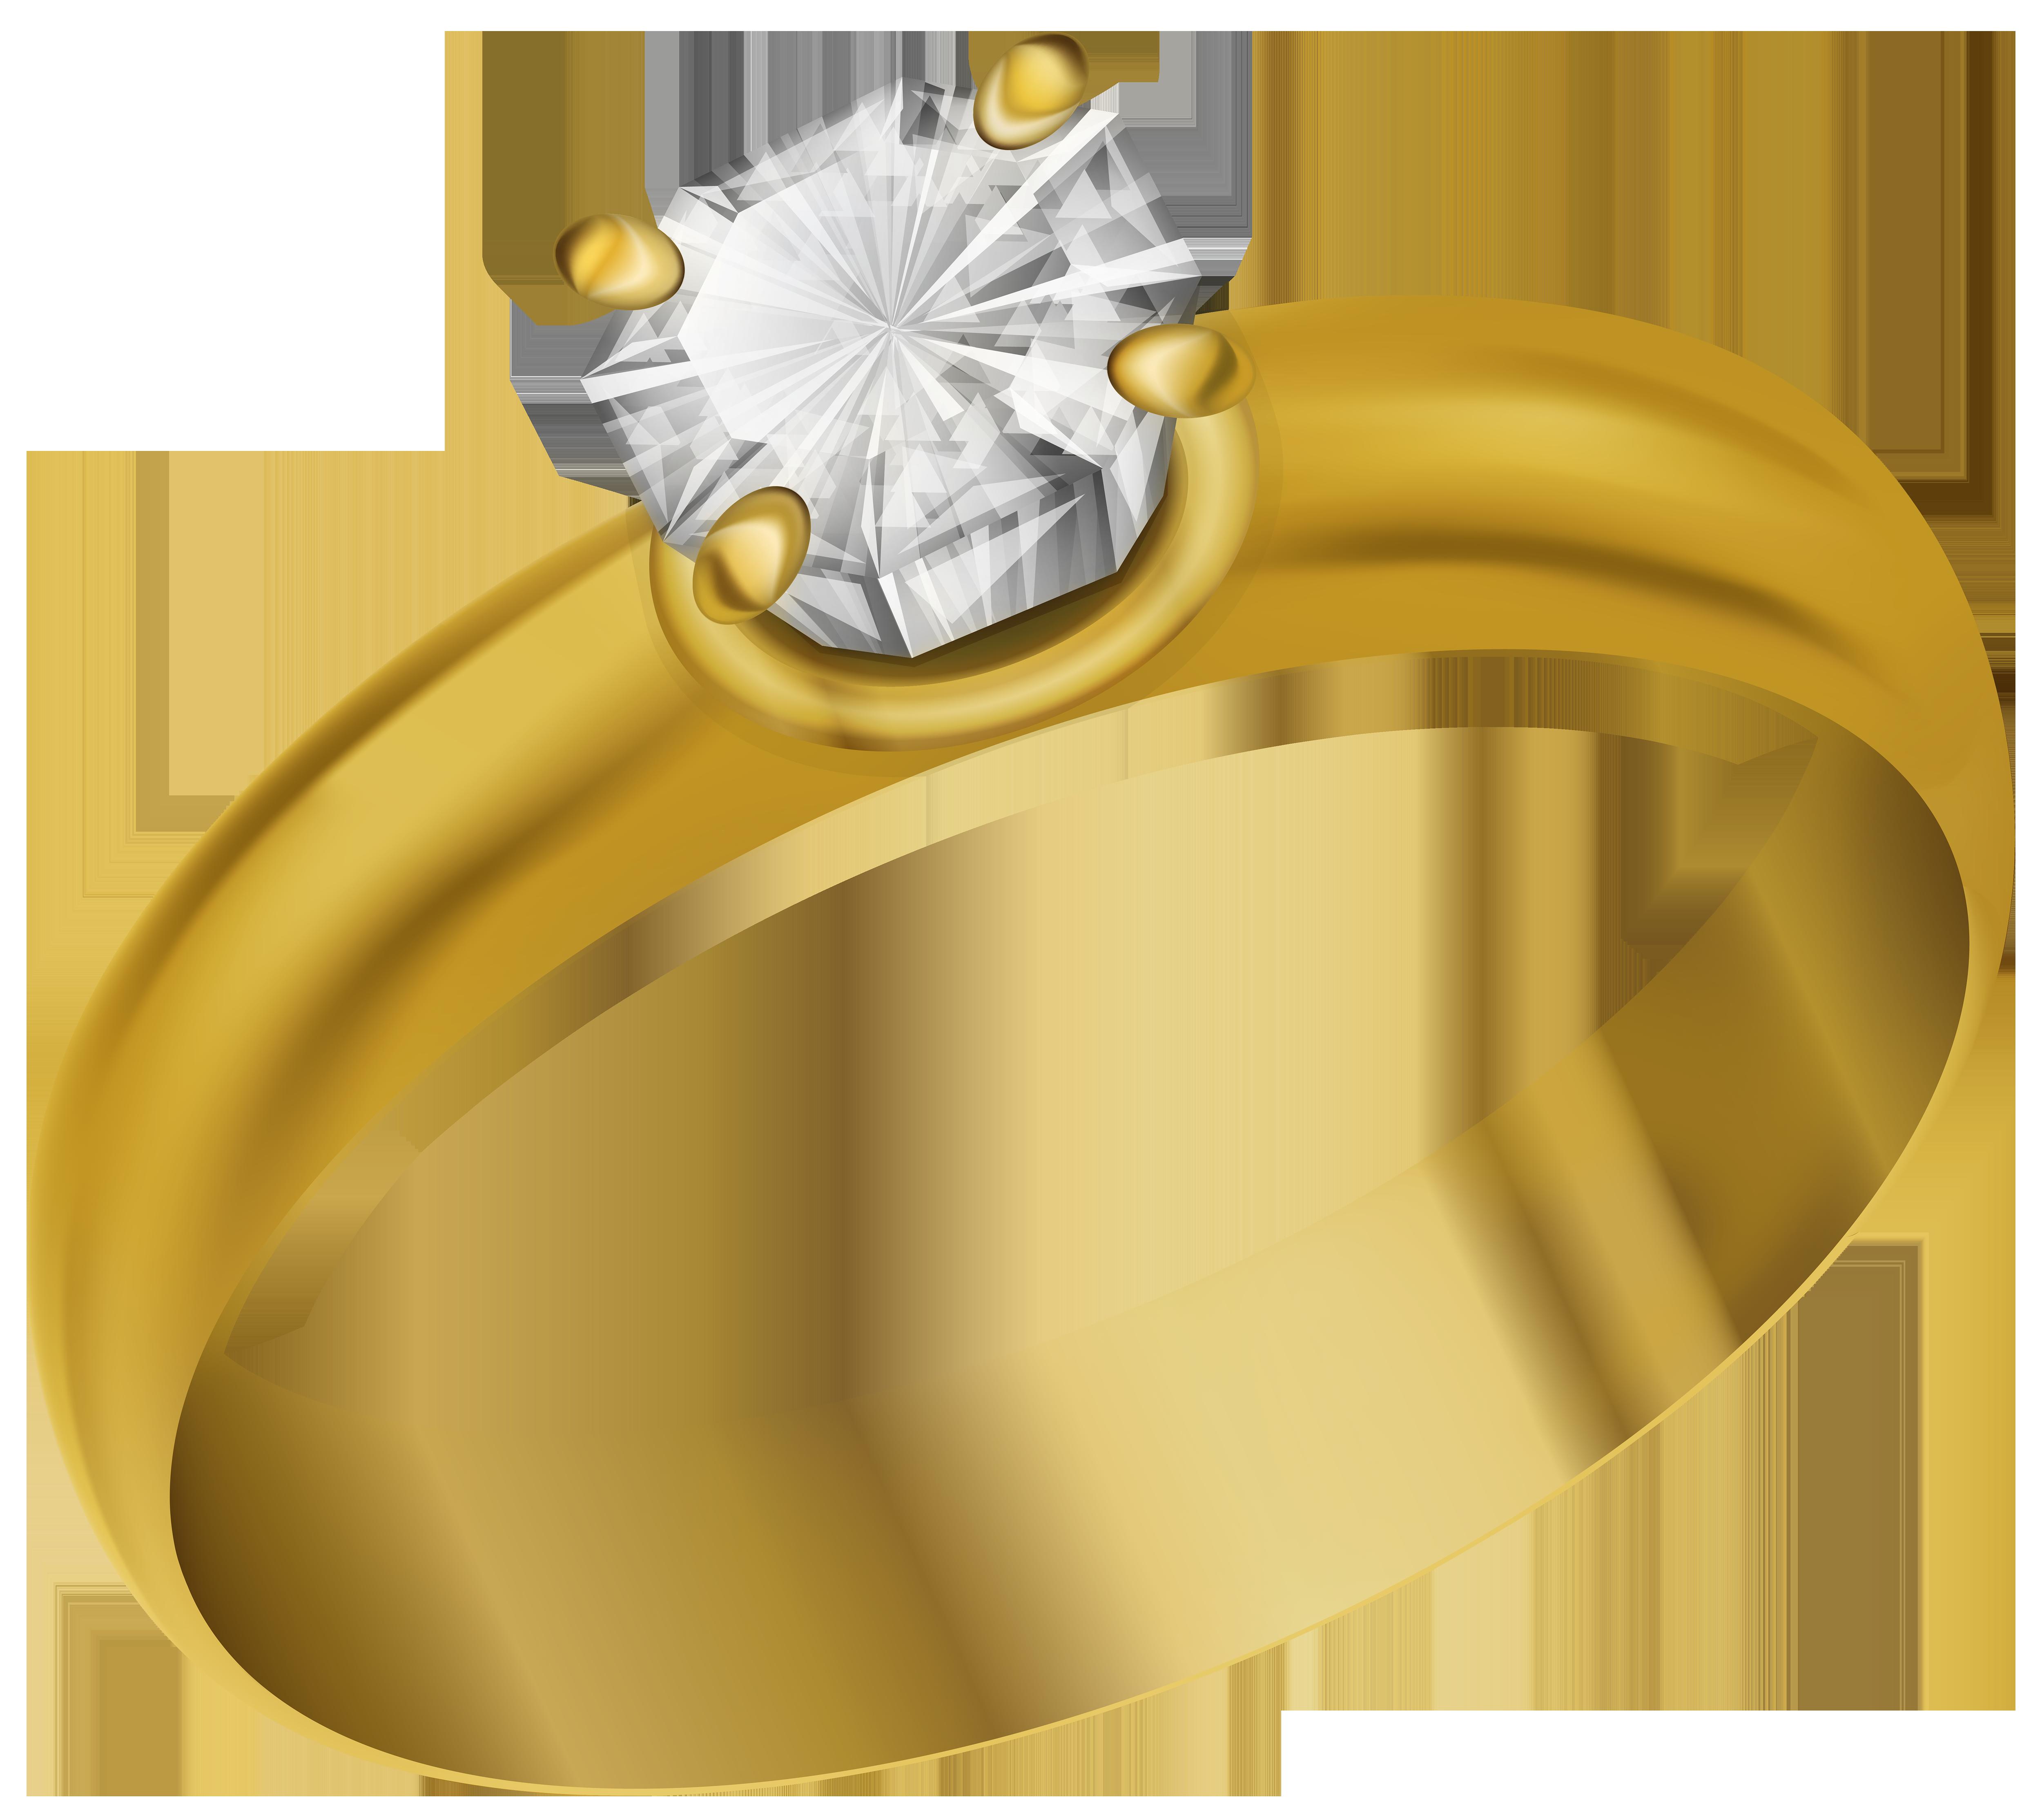 5000x4456 Ring Transparent Png Clip Art Imageu200b Gallery Yopriceville